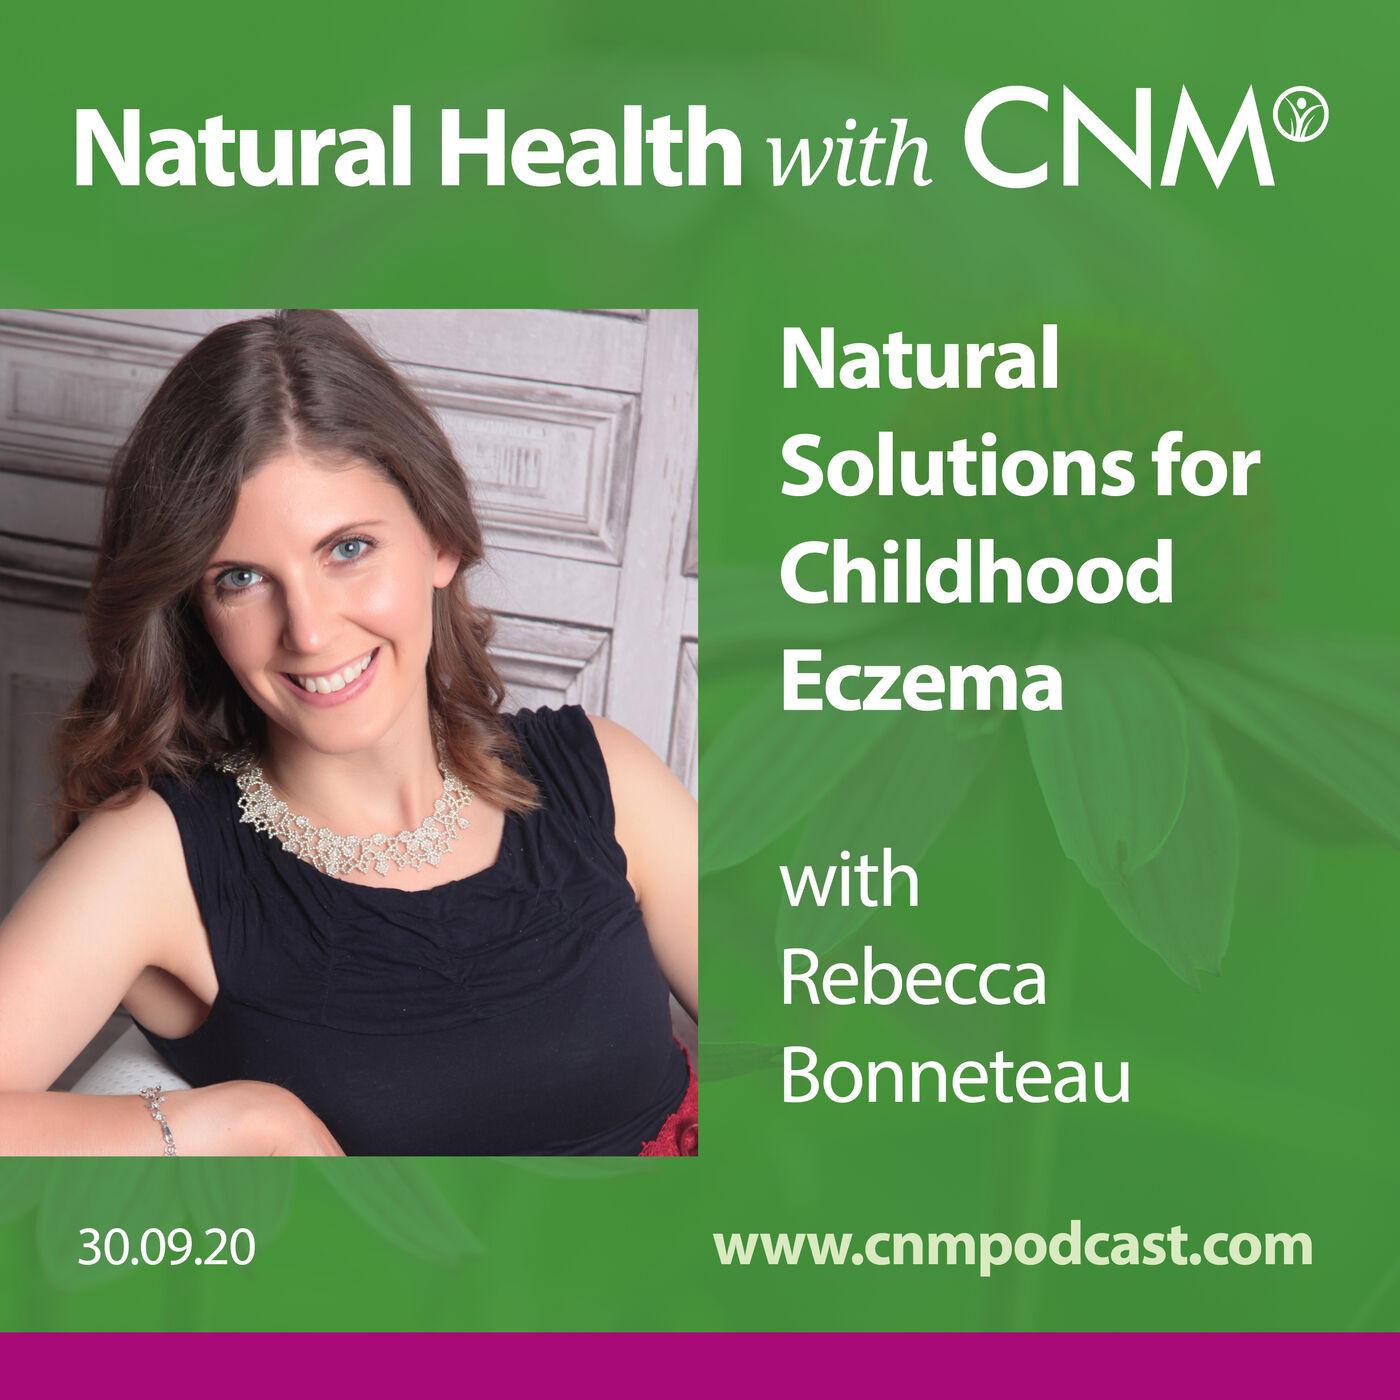 Childhood Eczema - Advice from Eczema Expert Rebecca Bonneteau